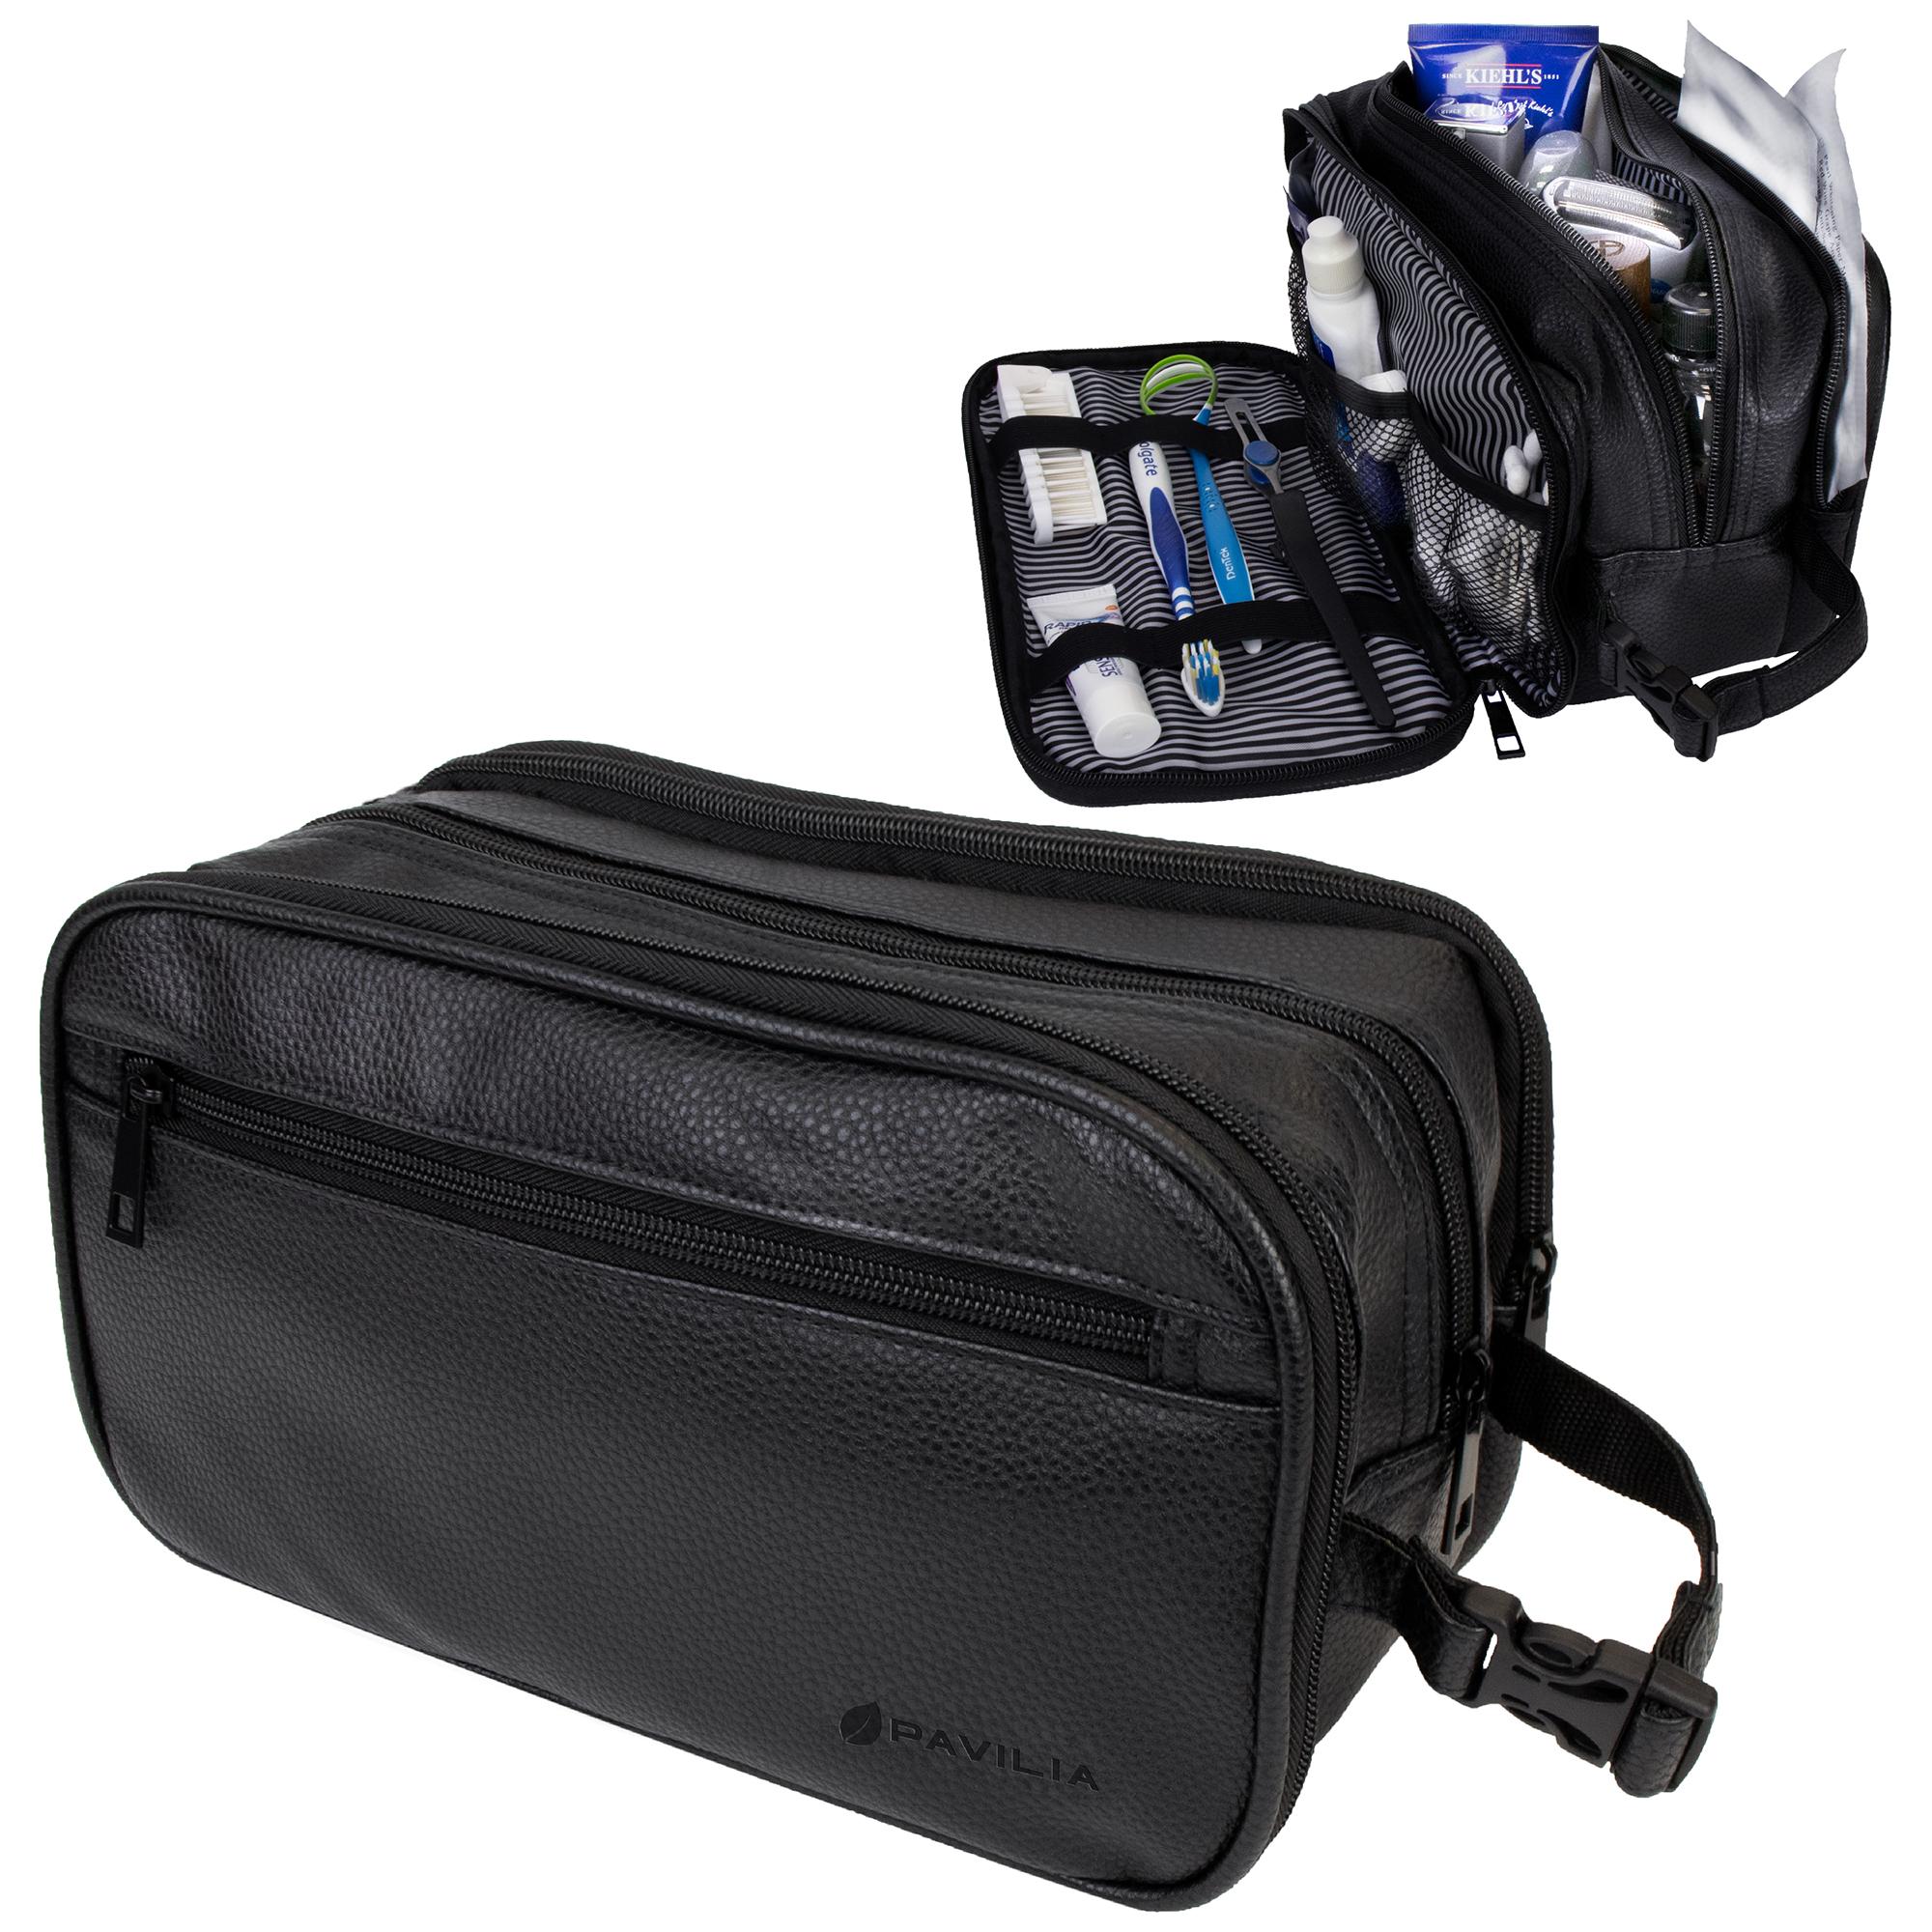 Mens Toiletry Bag With Zipper Pu Leather Case Organizer Portable Travel Dopp Kit Ebay